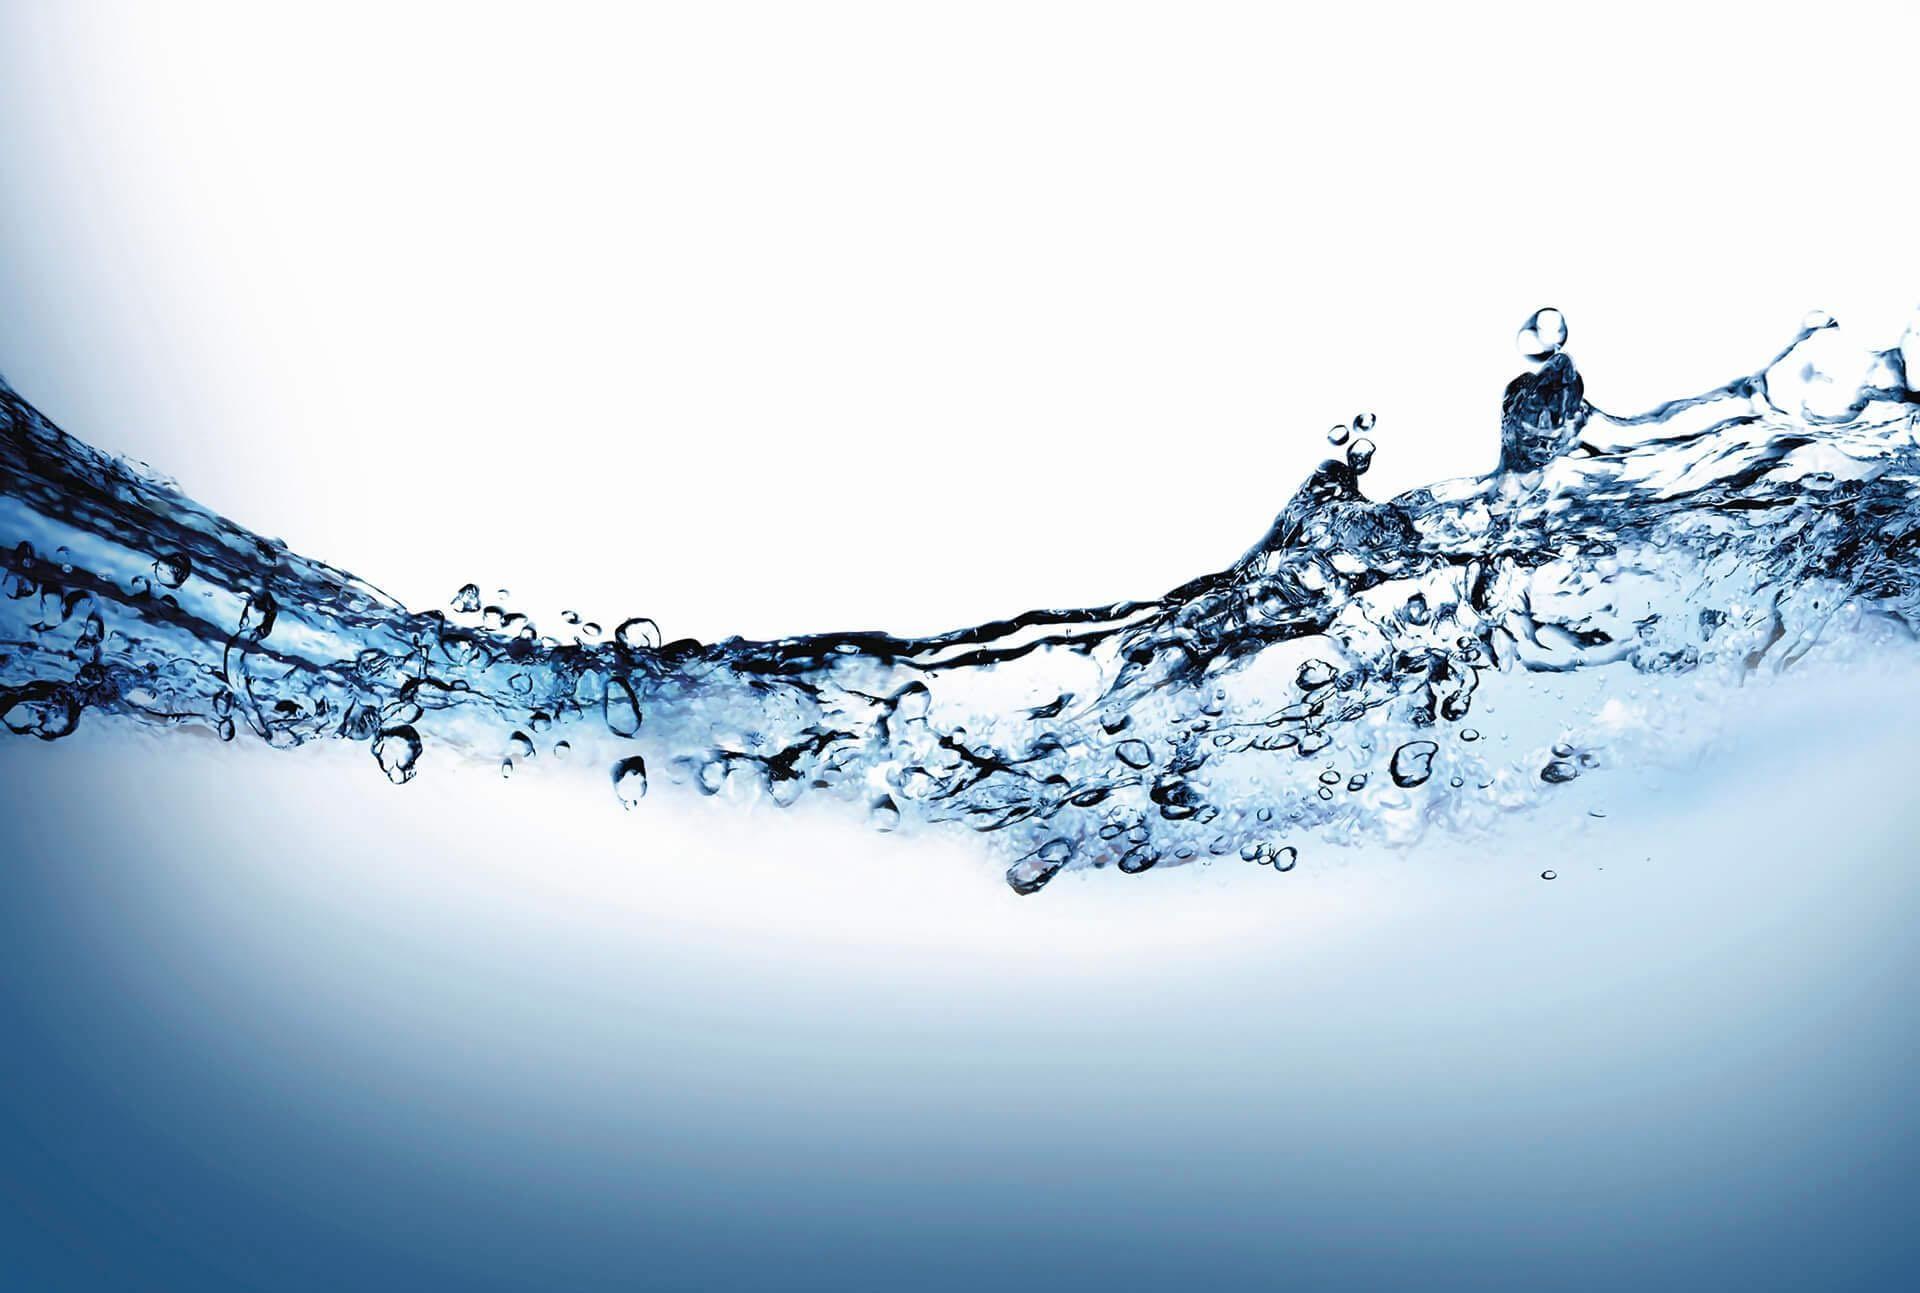 Vliestapete Water Flow weiß Fototapeten Tapeten Bauen Renovieren